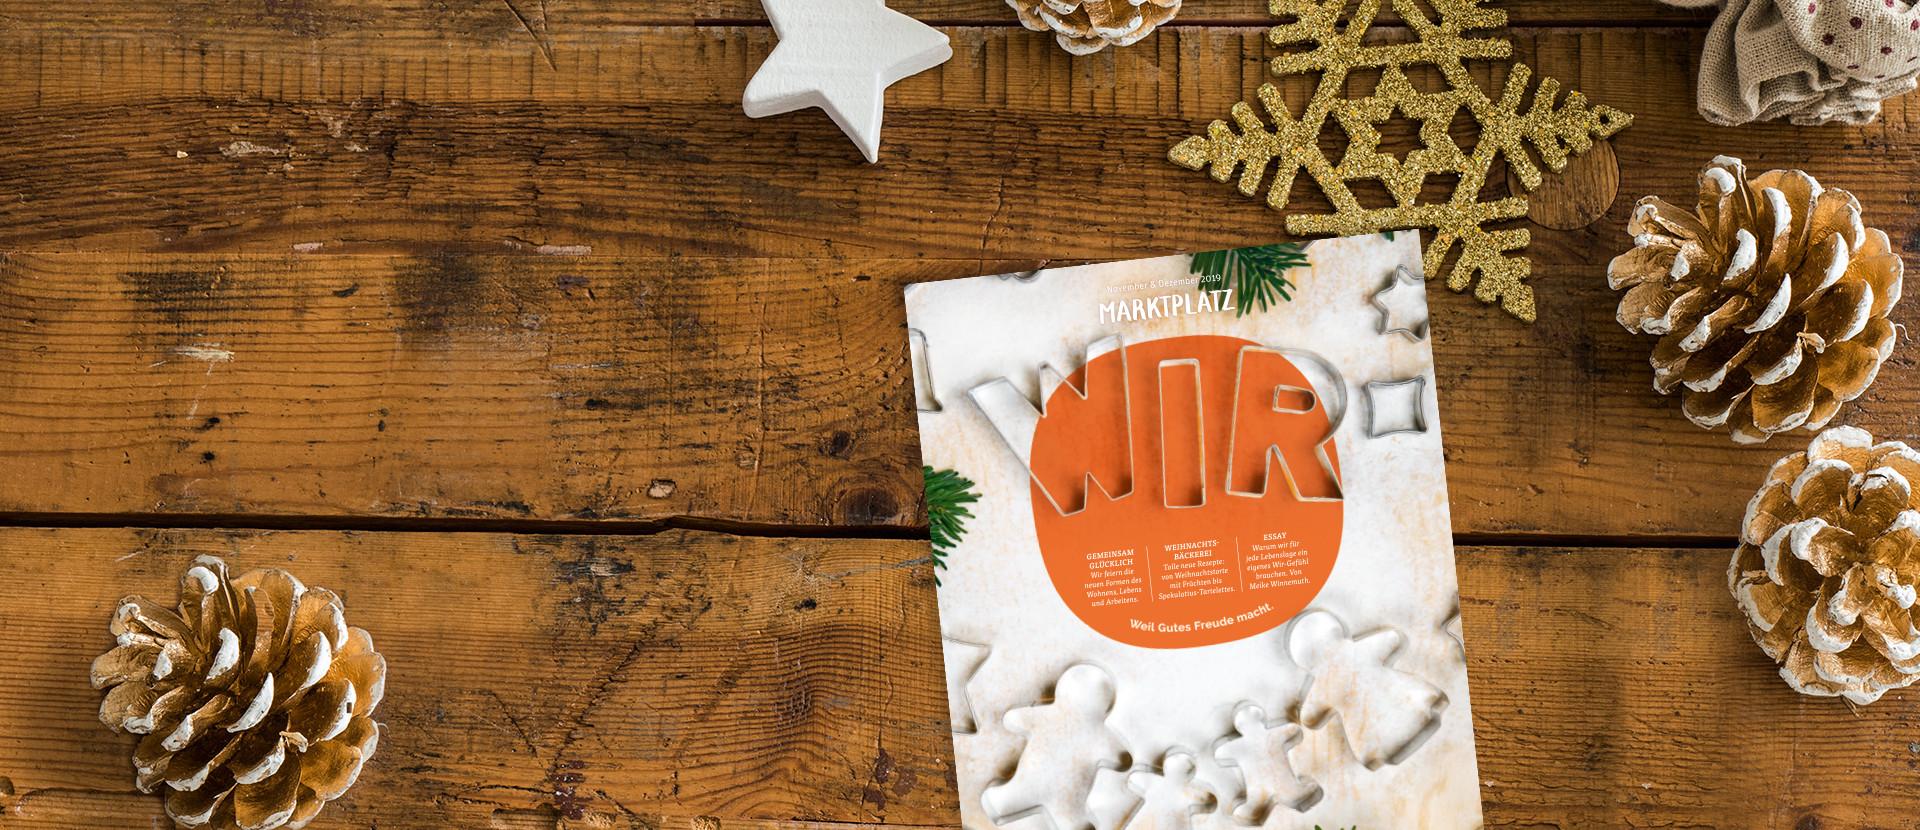 tegut Kundenmagazin November/Dezember 2019 auf Holzhintergrund